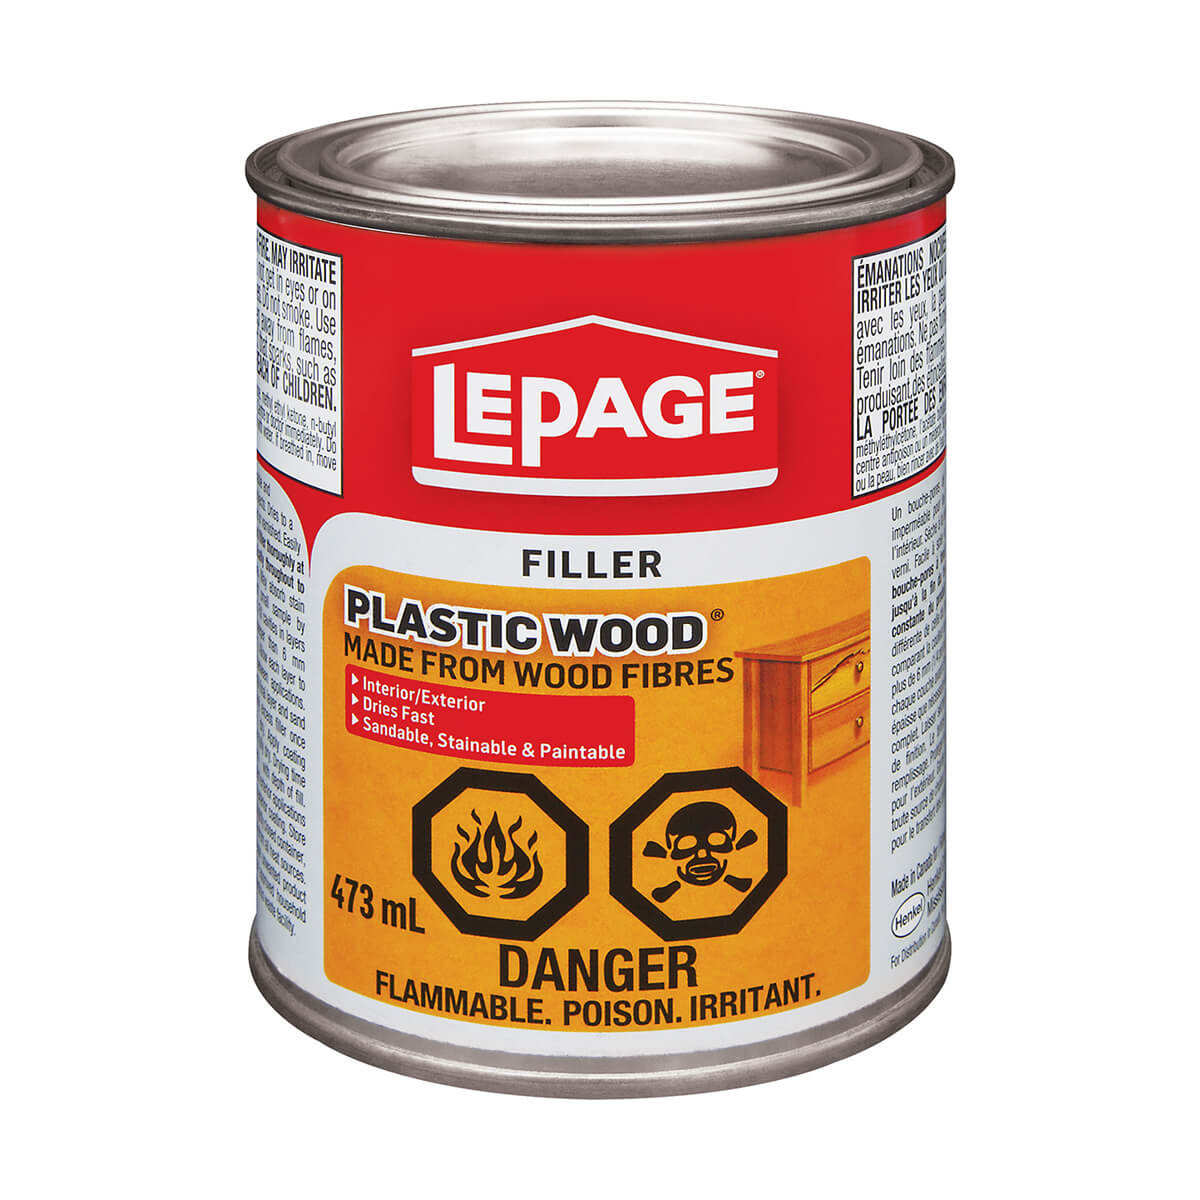 Plastic Wood Filler - Lepage - 473ml